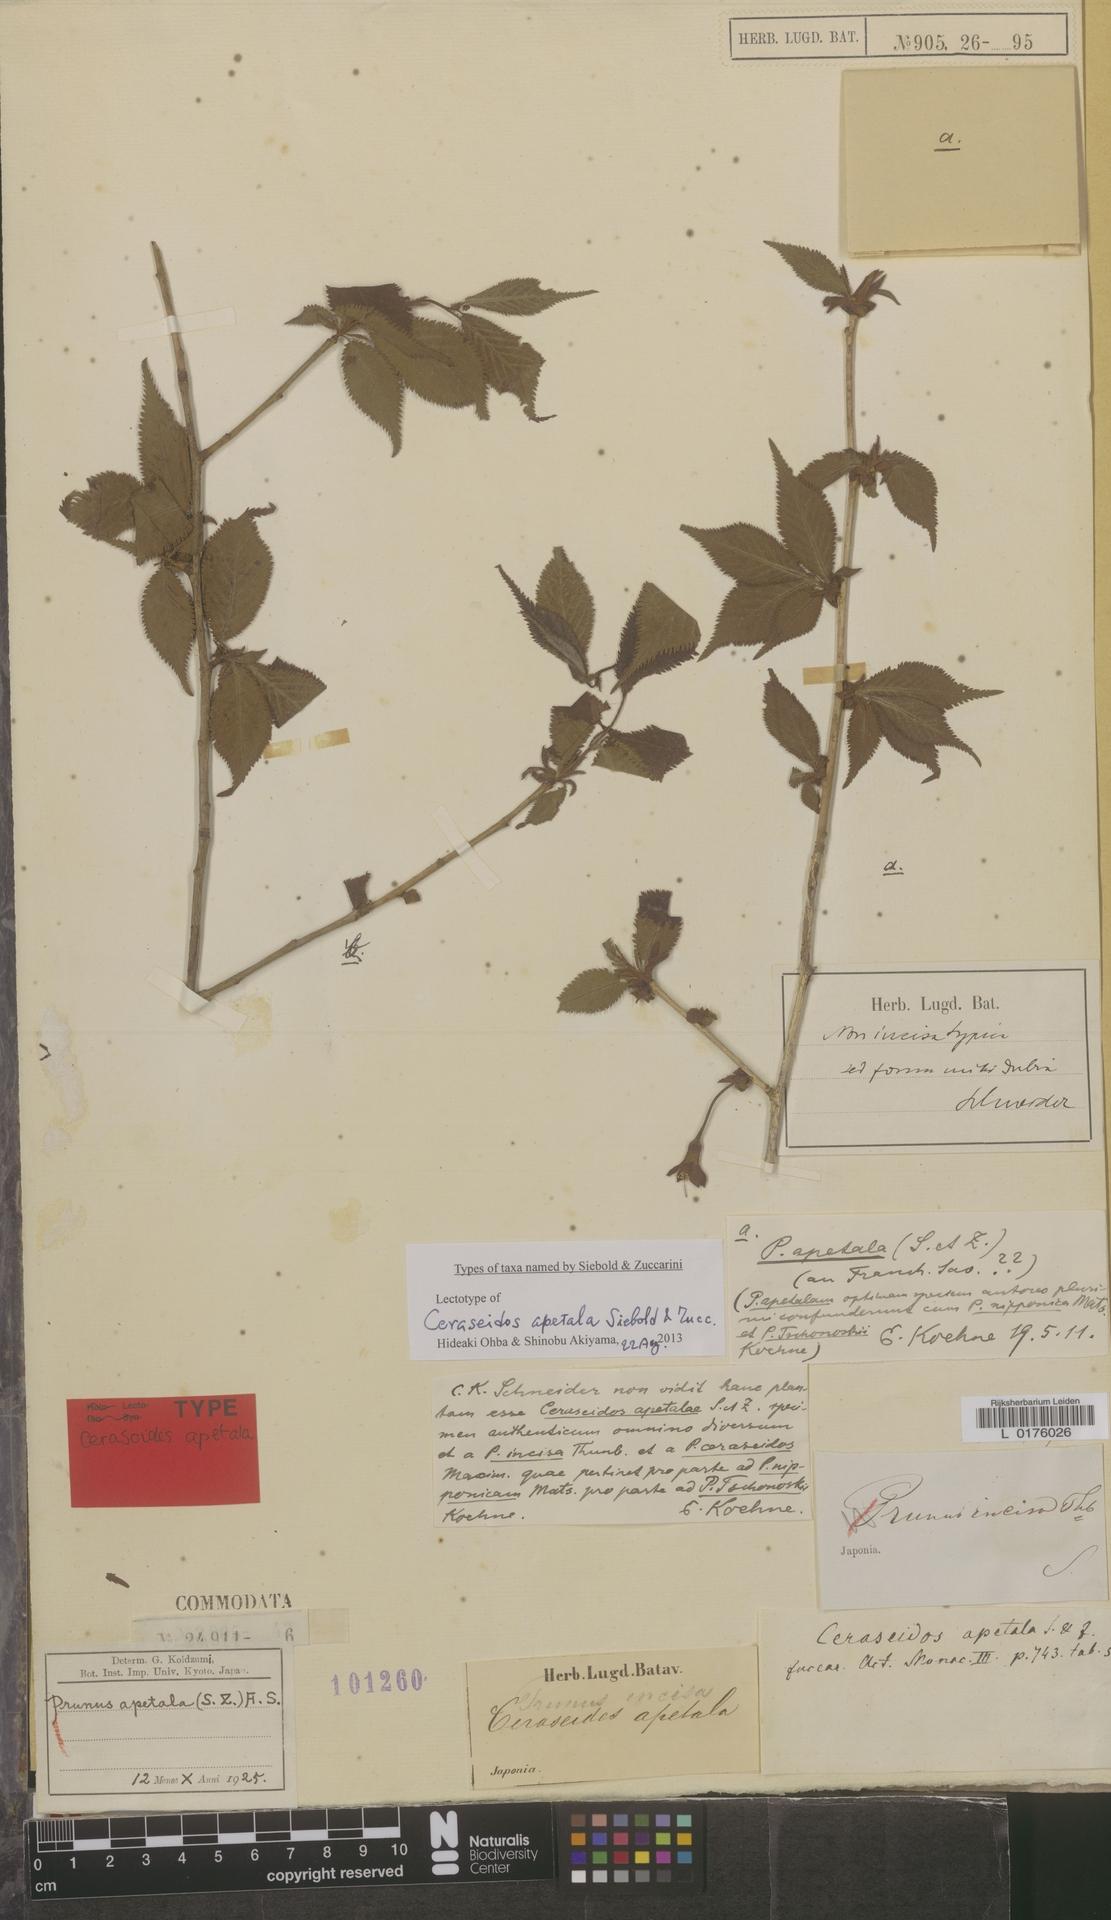 L  0176026   Prunus apetala (Siebold & Zucc.) Franch. & Sav.